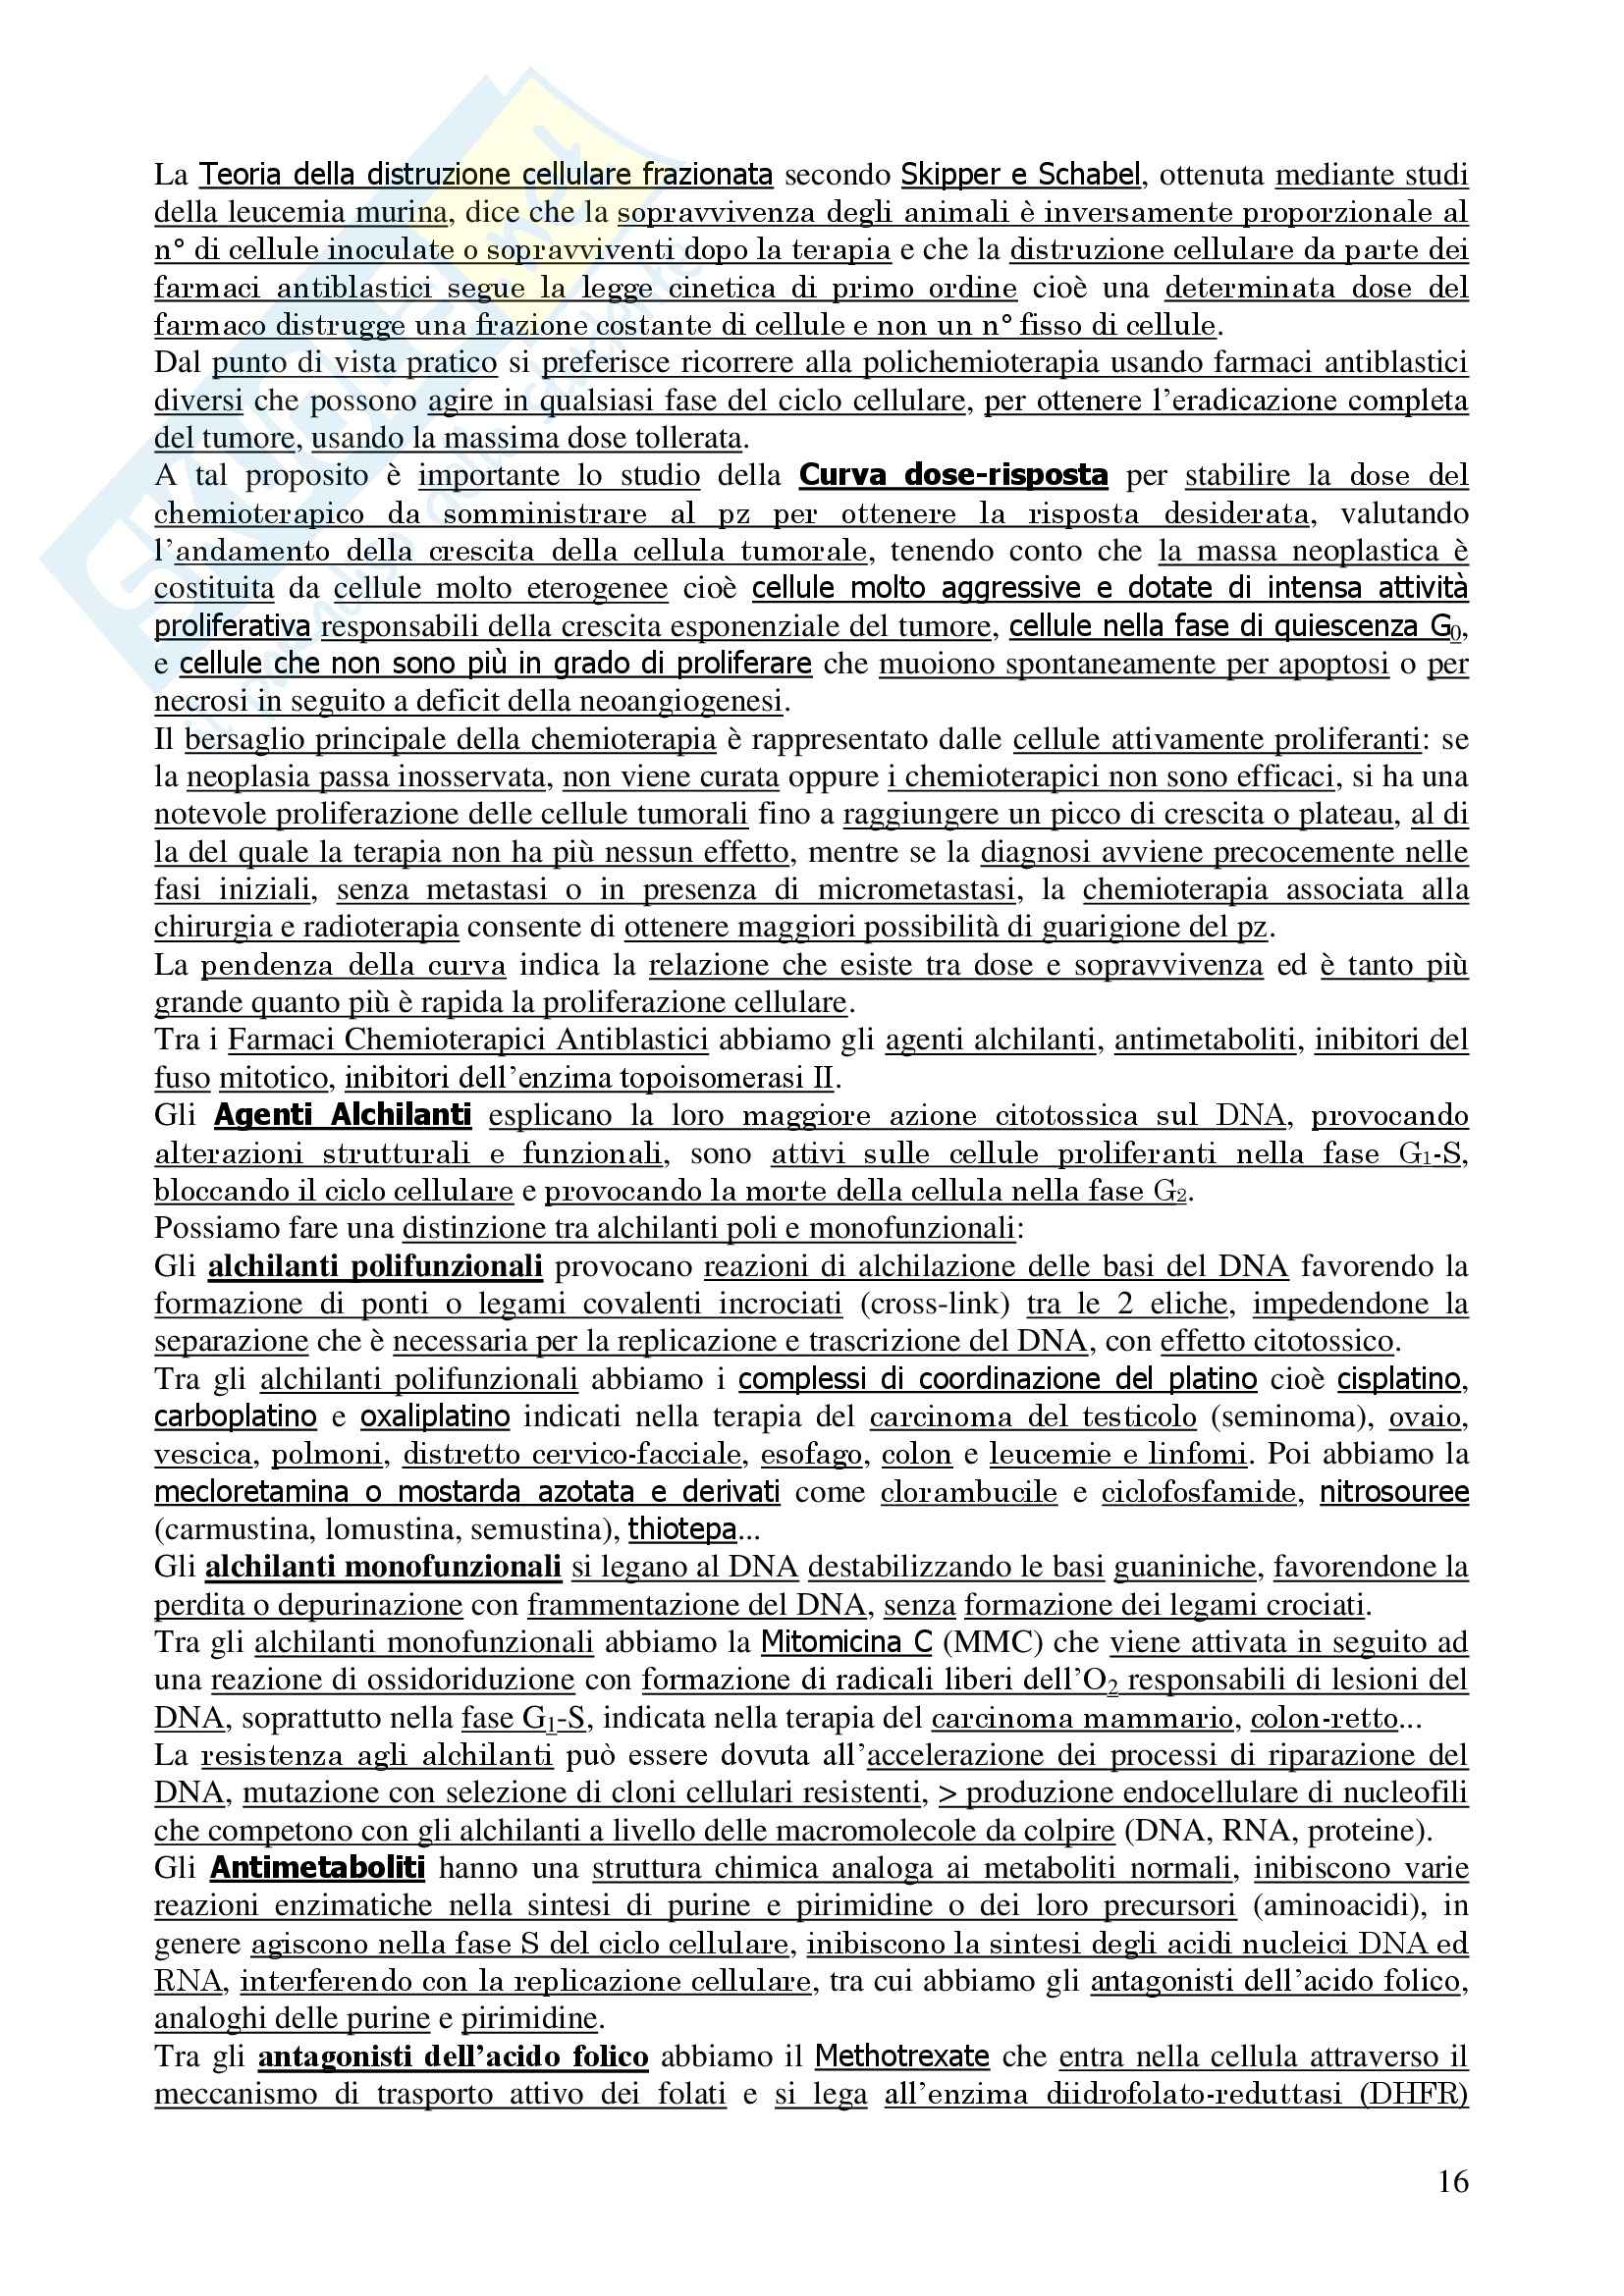 Oncologia Clinica - Dispensa Oncologia Medica-Clinica Pag. 16